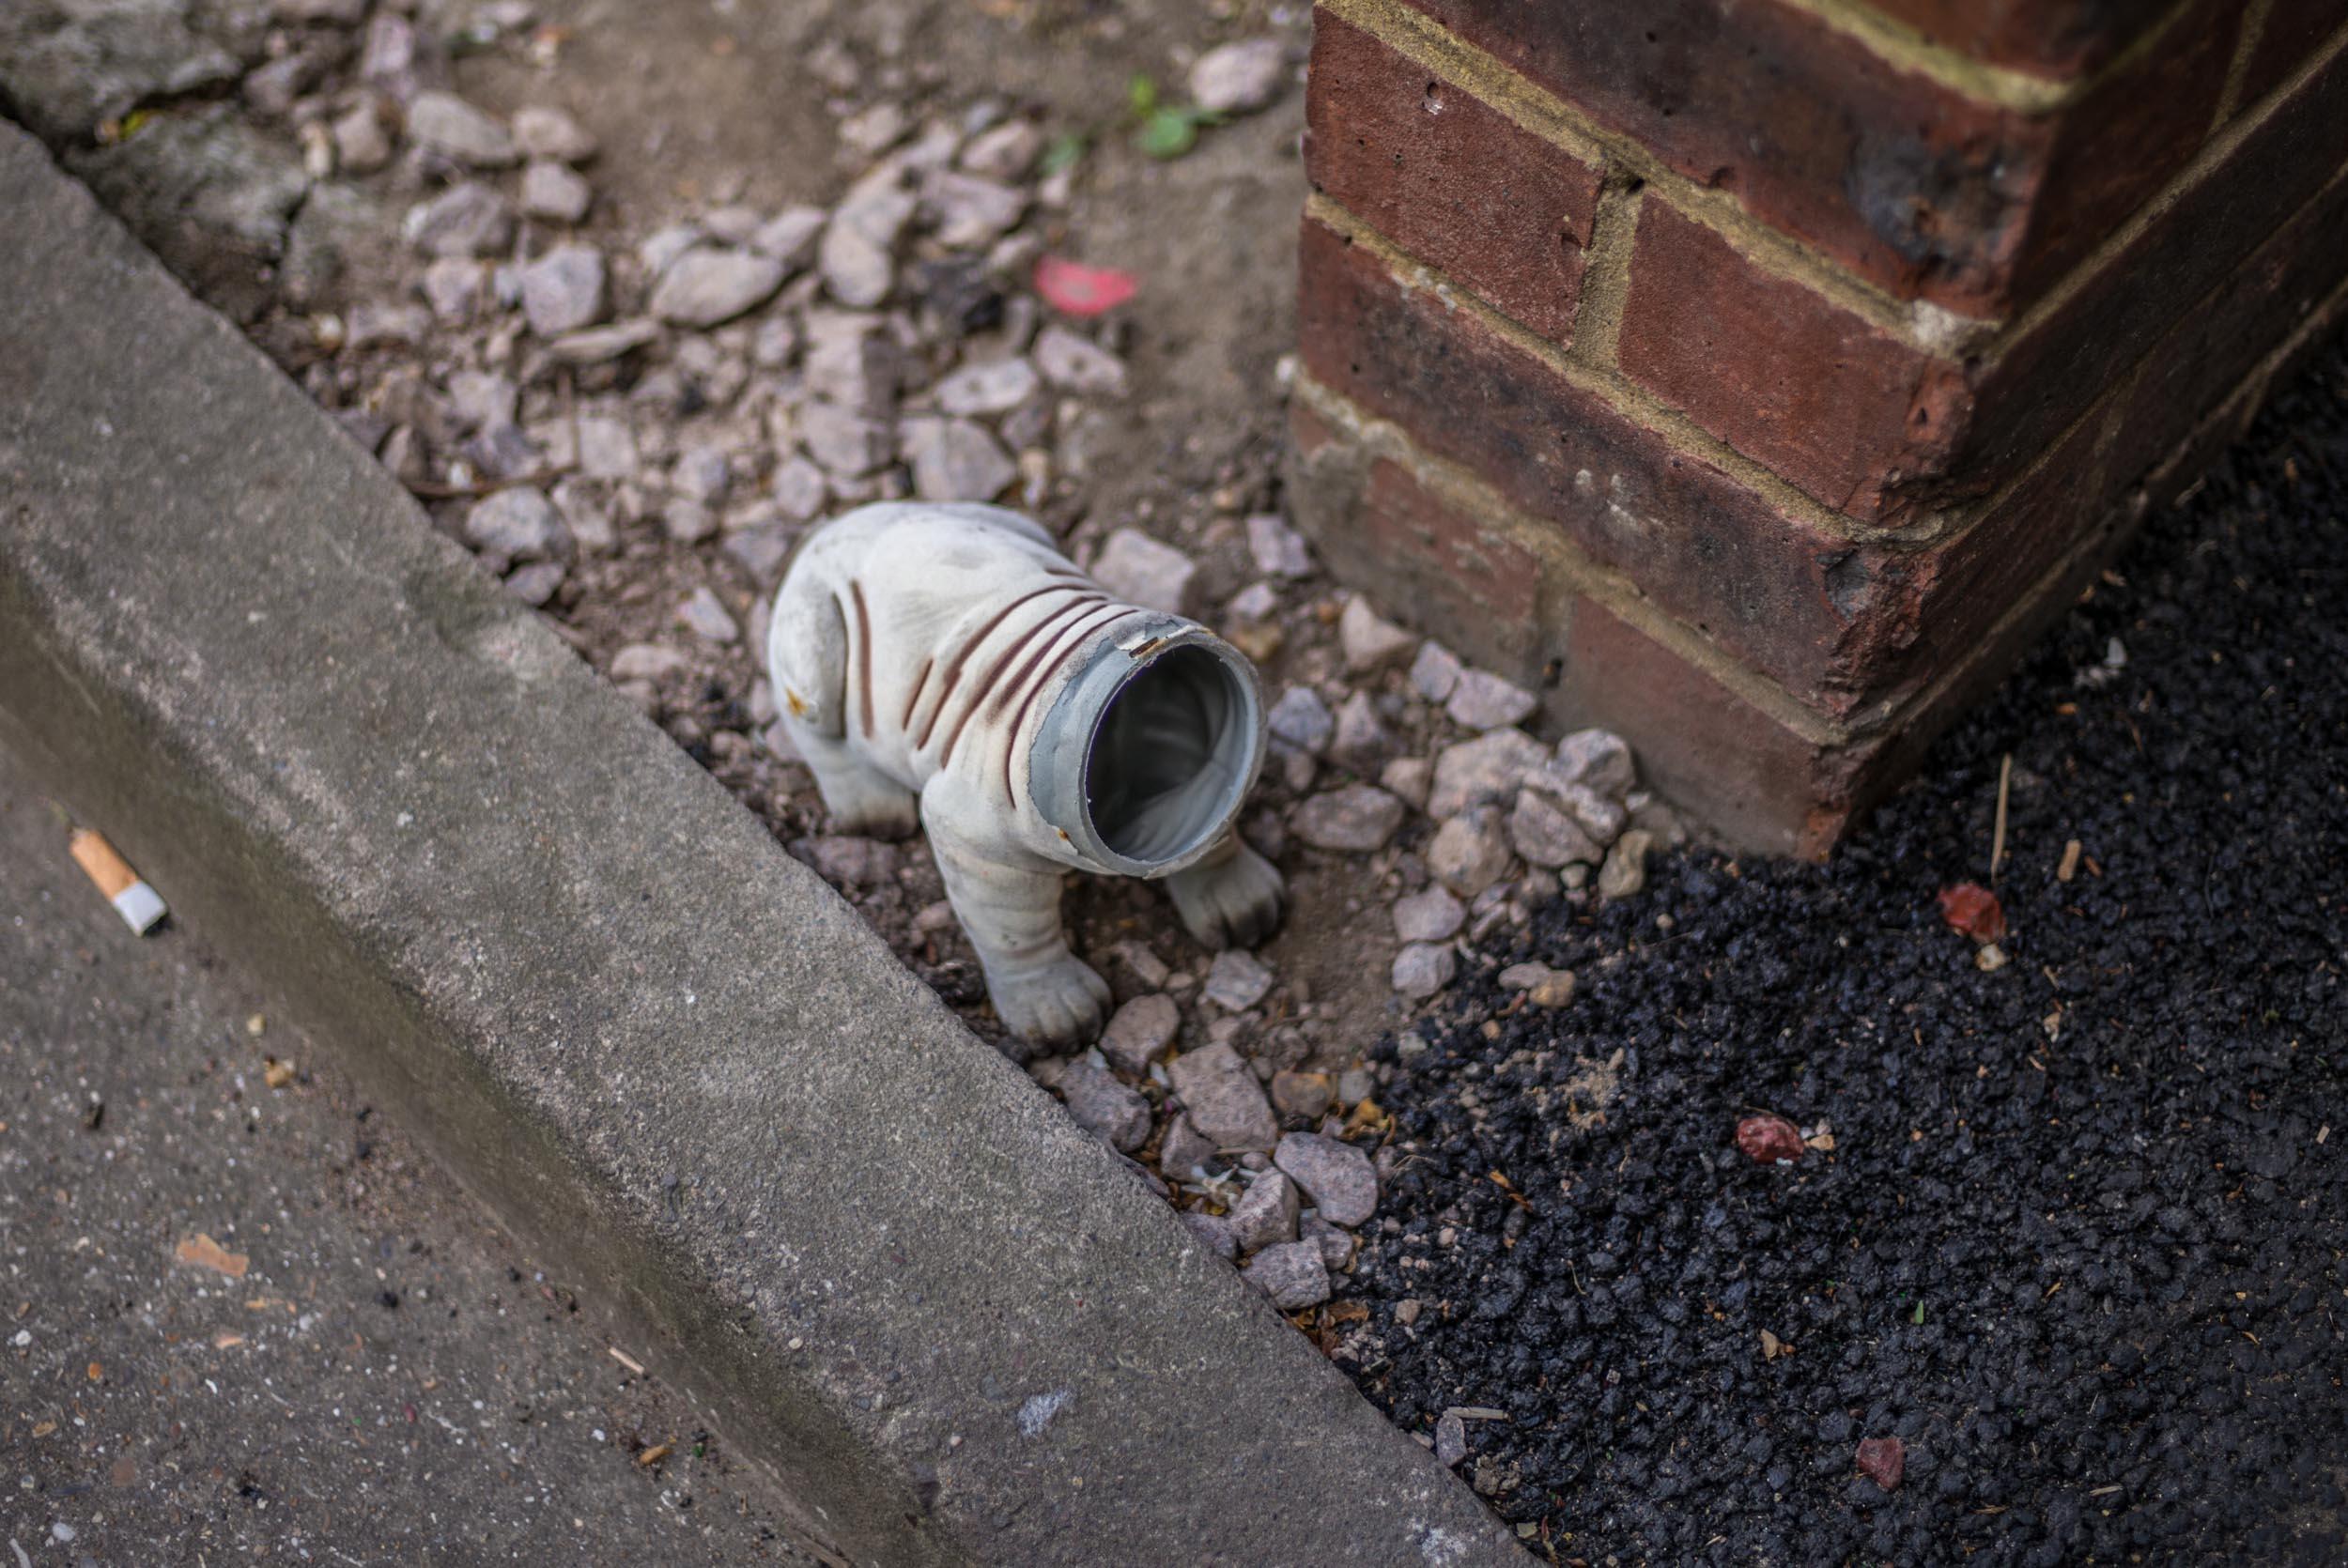 Plastic Dog [Headless]. London 2017